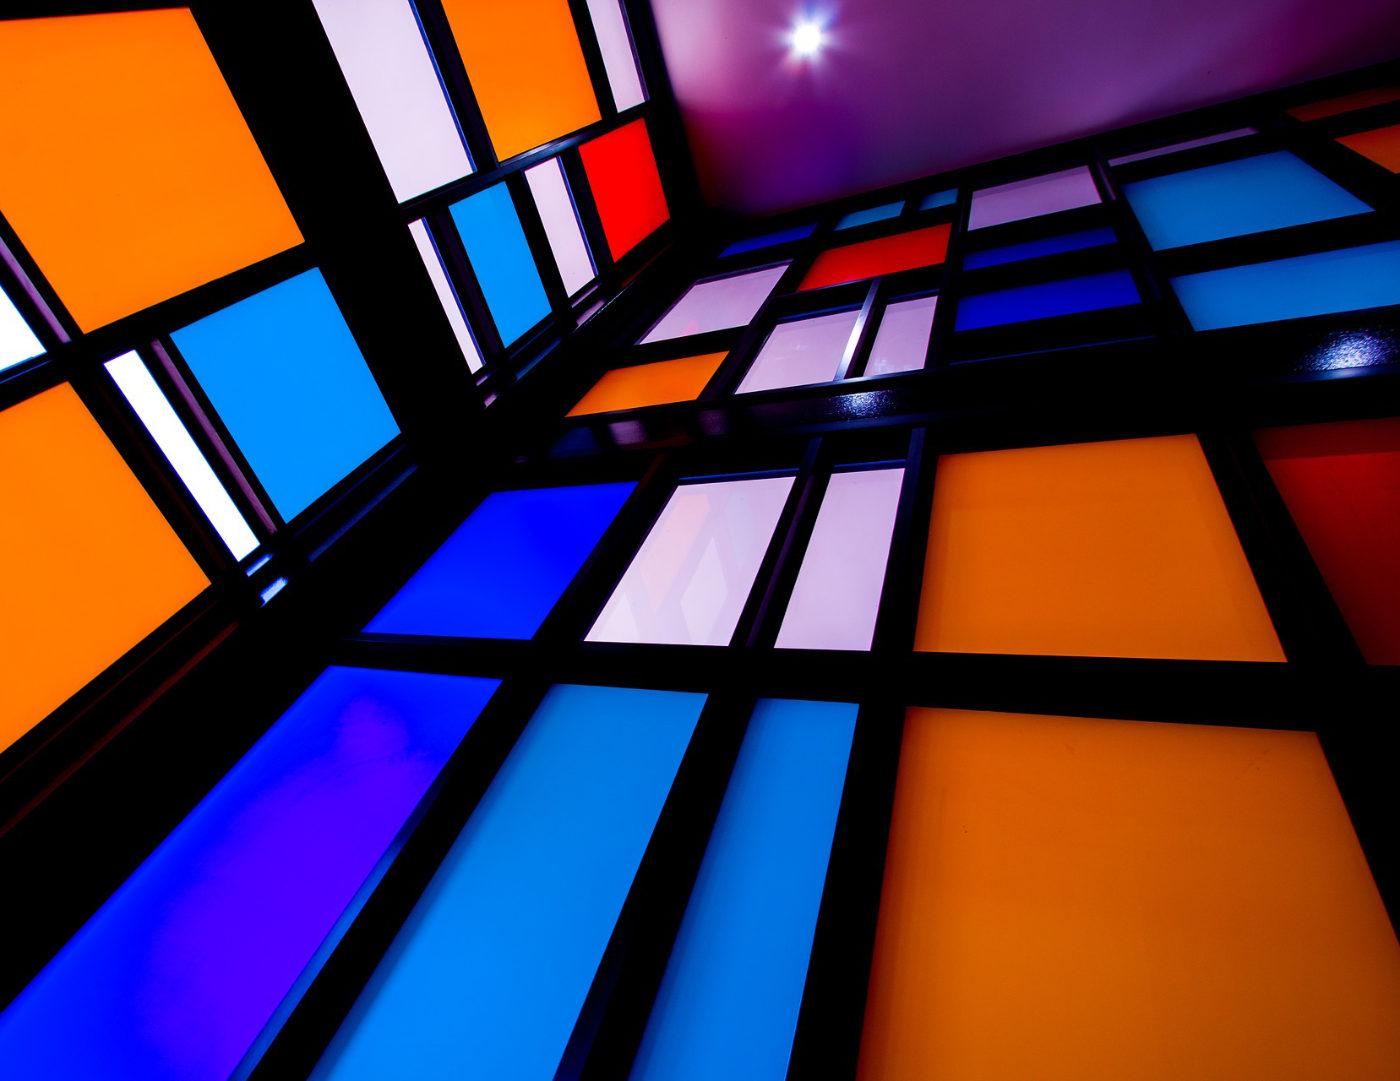 Mondrian-style glass walls in blues & orange in black frames via Pixabay